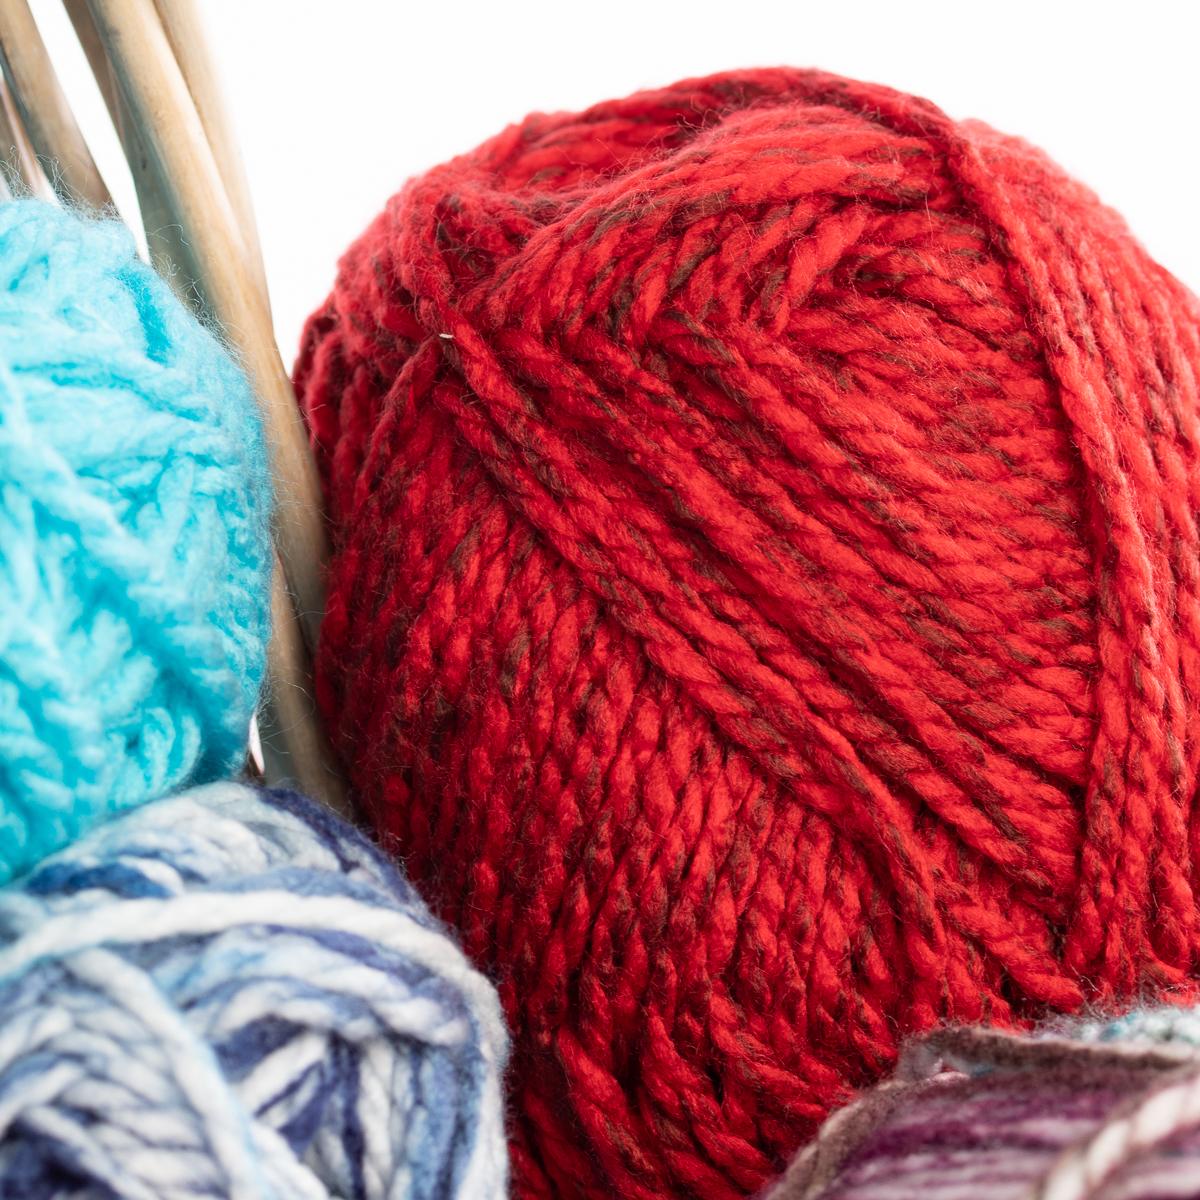 3pk-Premier-Yarns-Deborah-Norville-Serenity-100-Acrylic-Yarn-Chunky-5-Knitting thumbnail 44